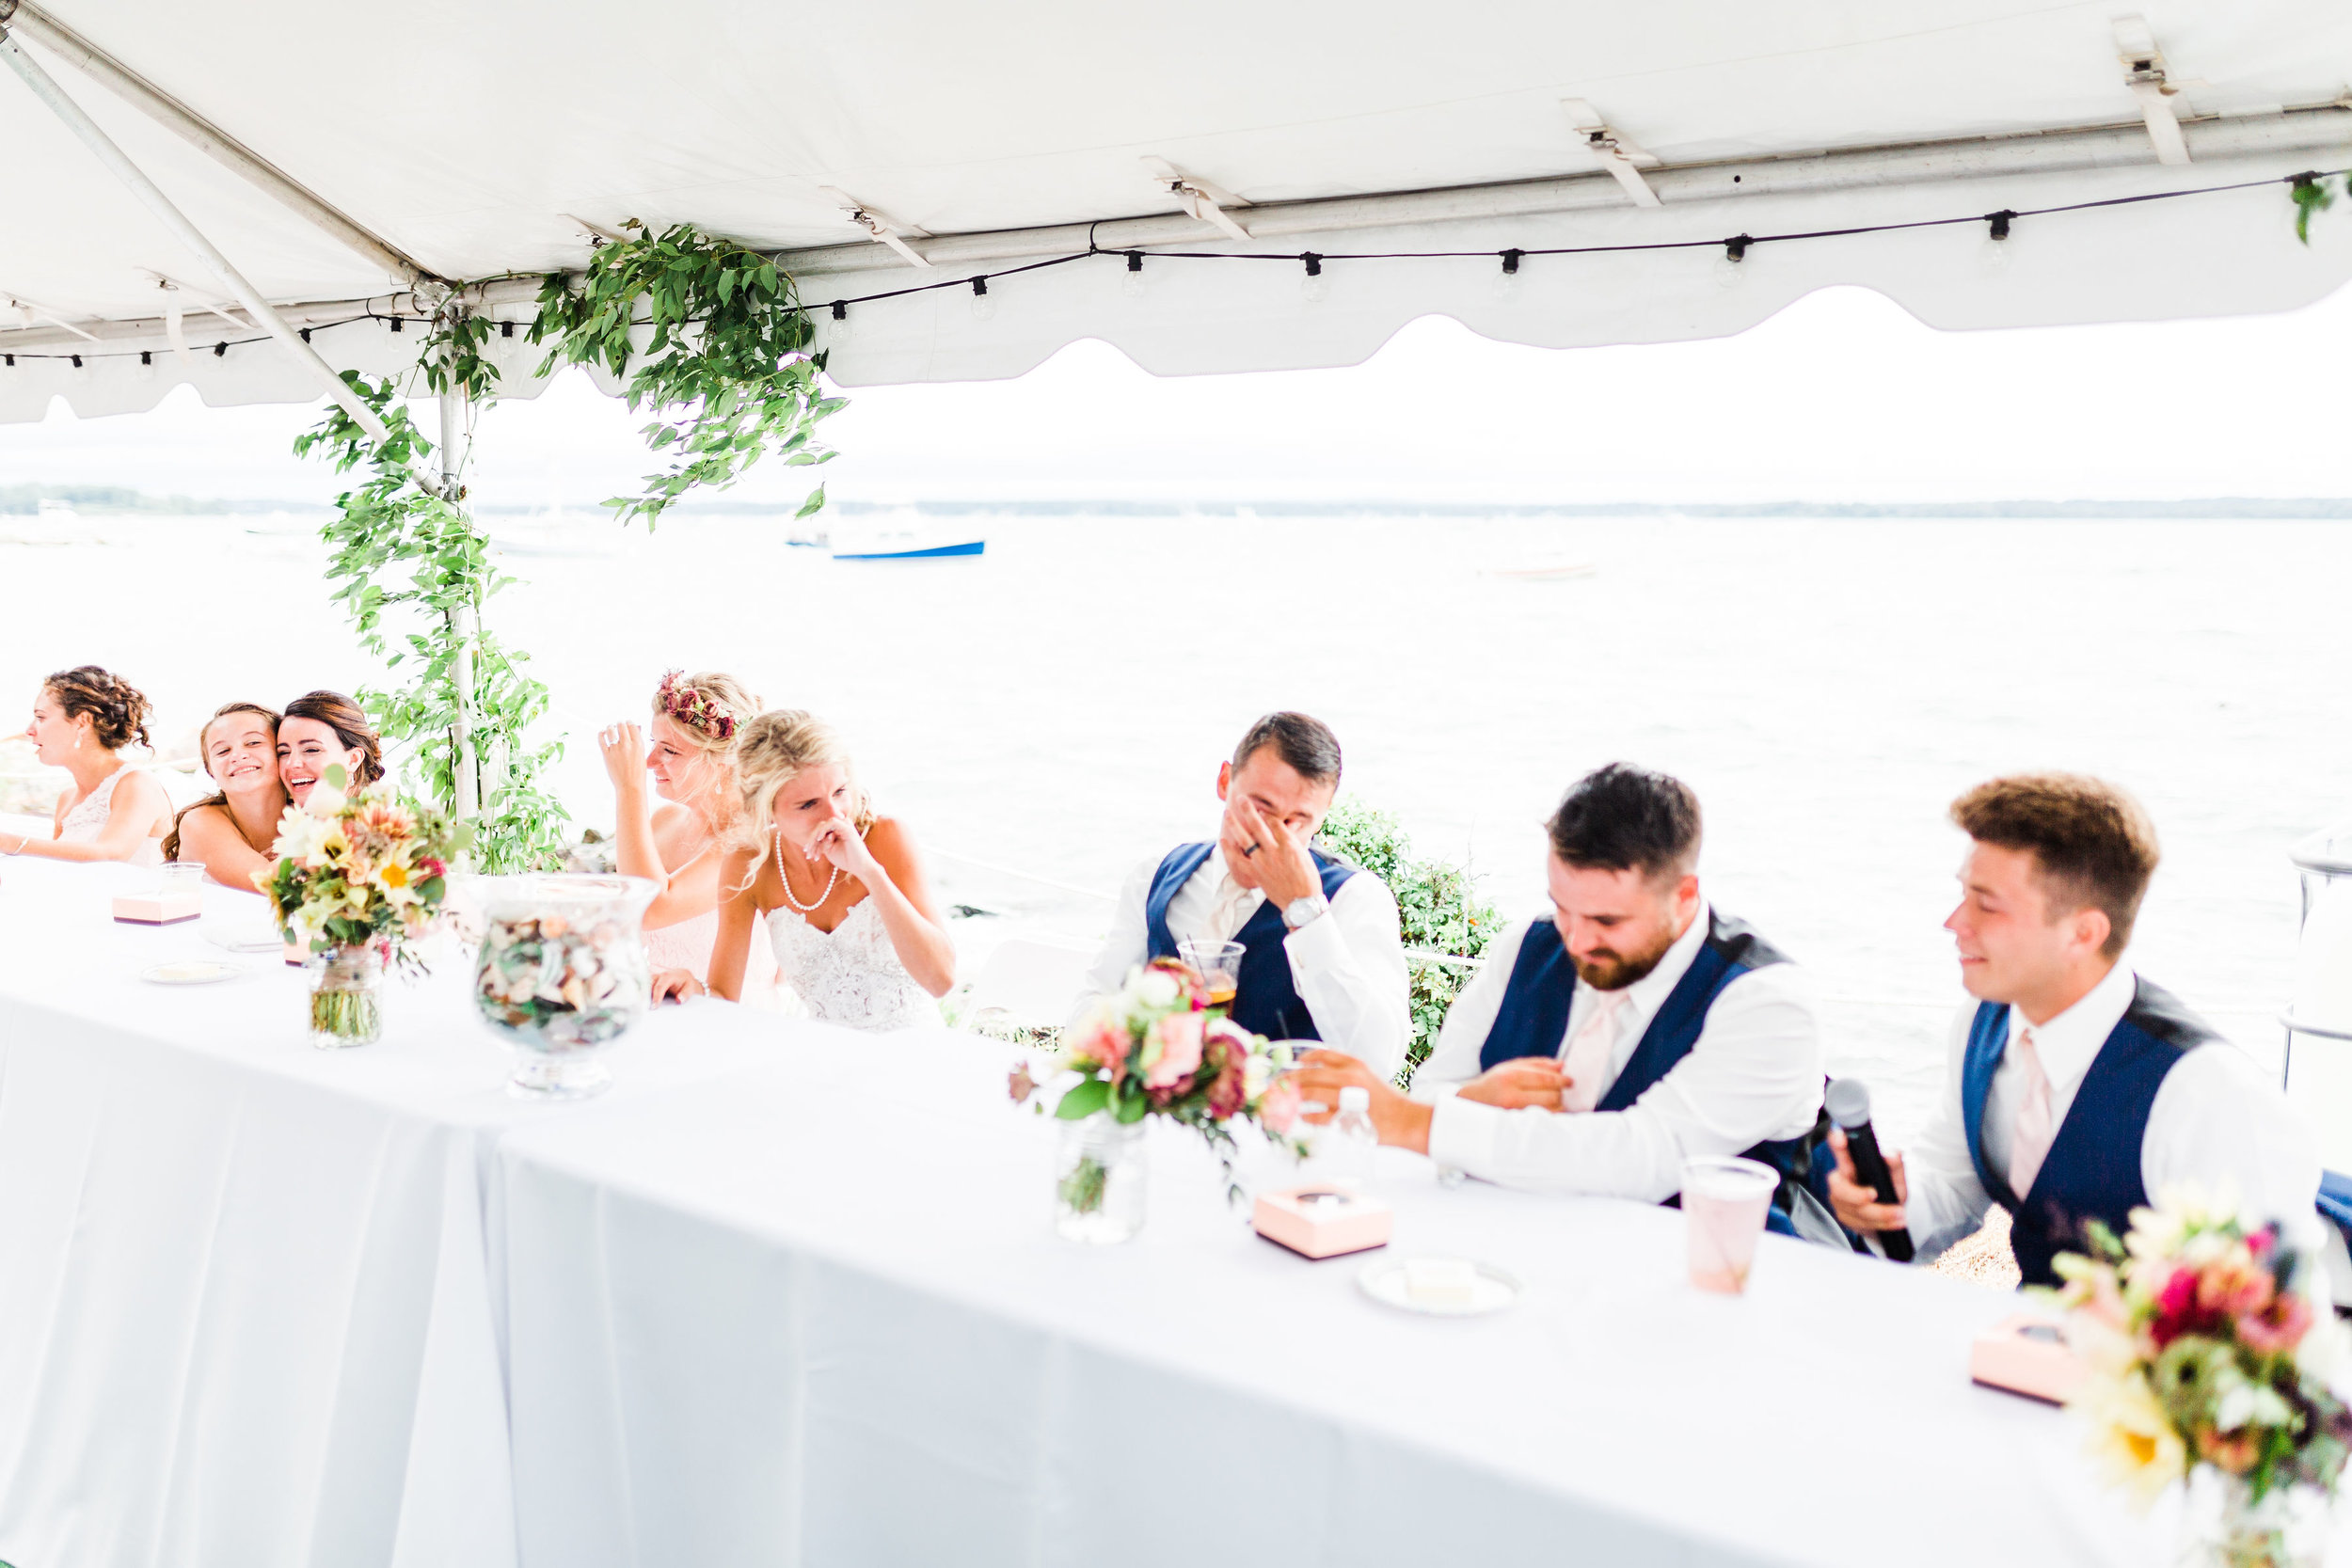 Long Island Maine Wedding_081818_915.jpg